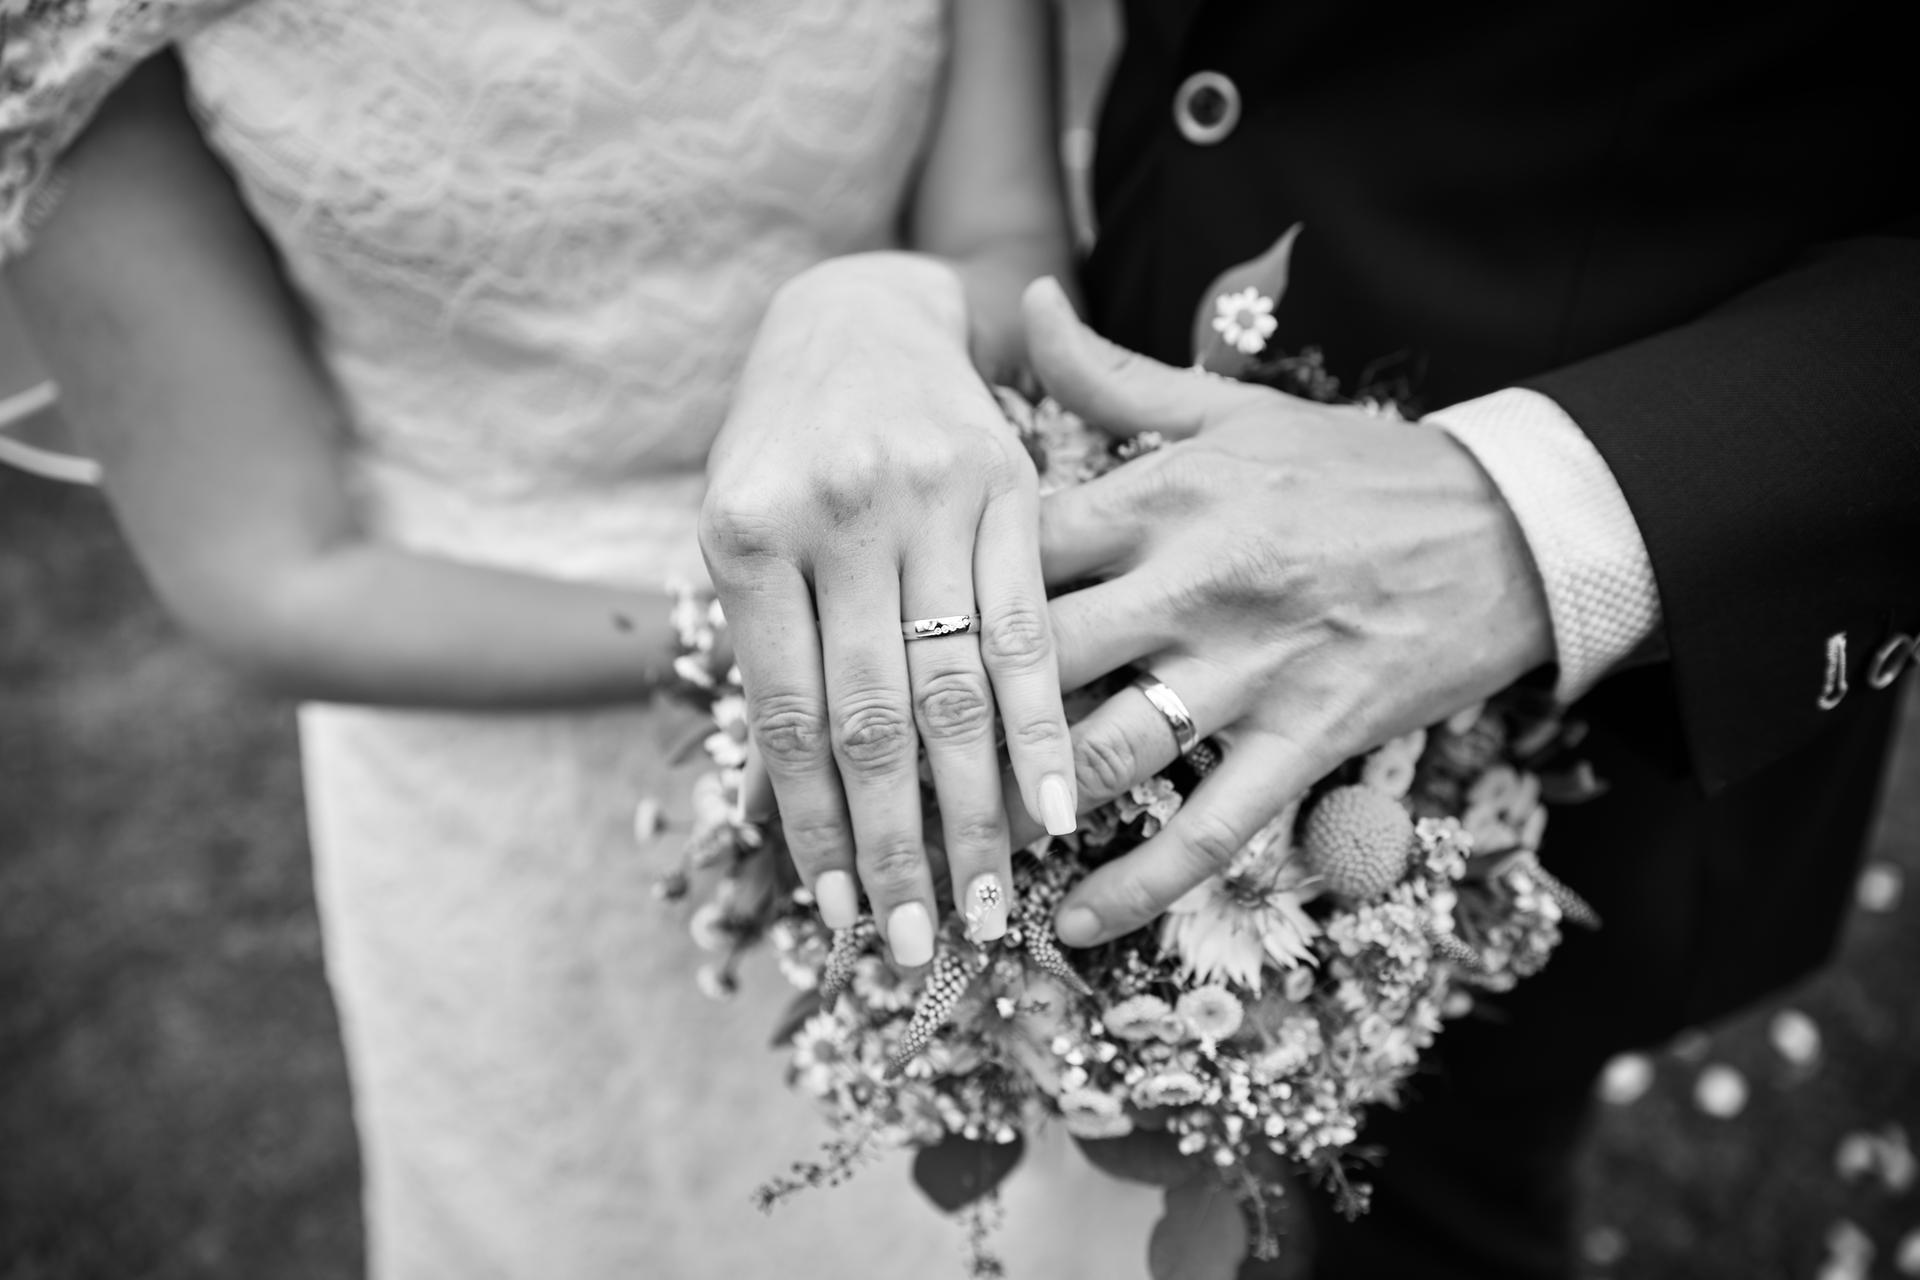 Svatba 6.6.2020 - Prstýnky: Rýdl  Ruku v ruce.